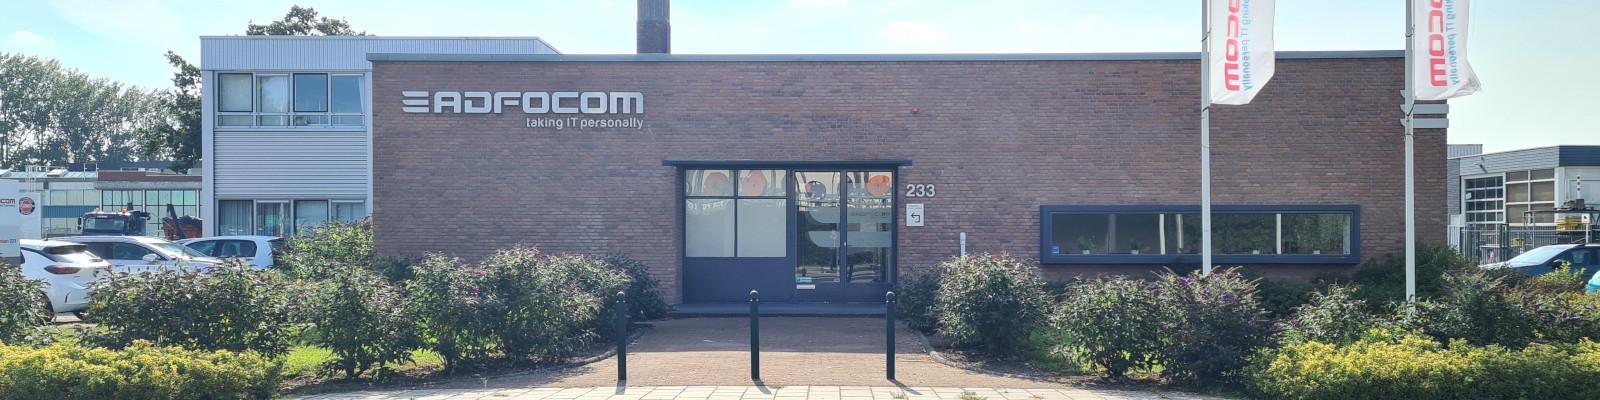 Adfocom kantoor